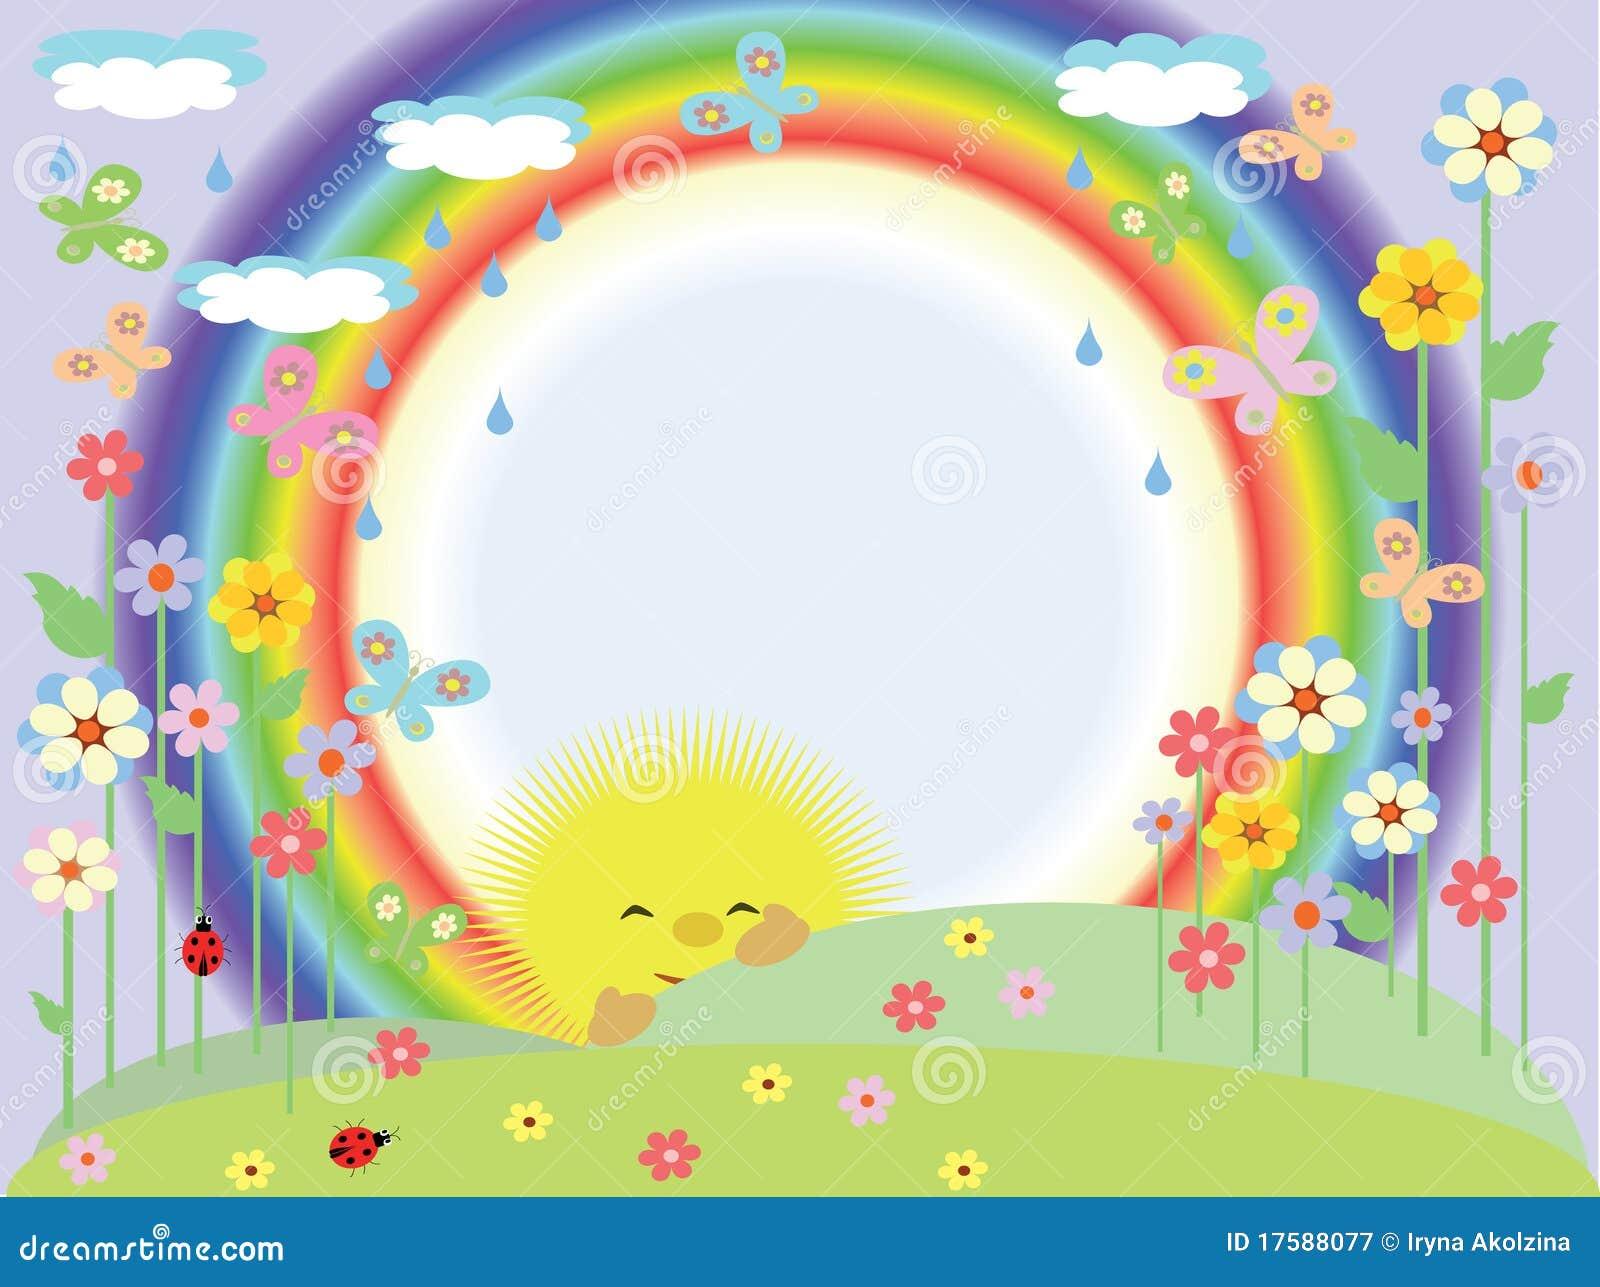 Sun Rainbow Frame Stock Illustrations – 947 Sun Rainbow Frame Stock ...